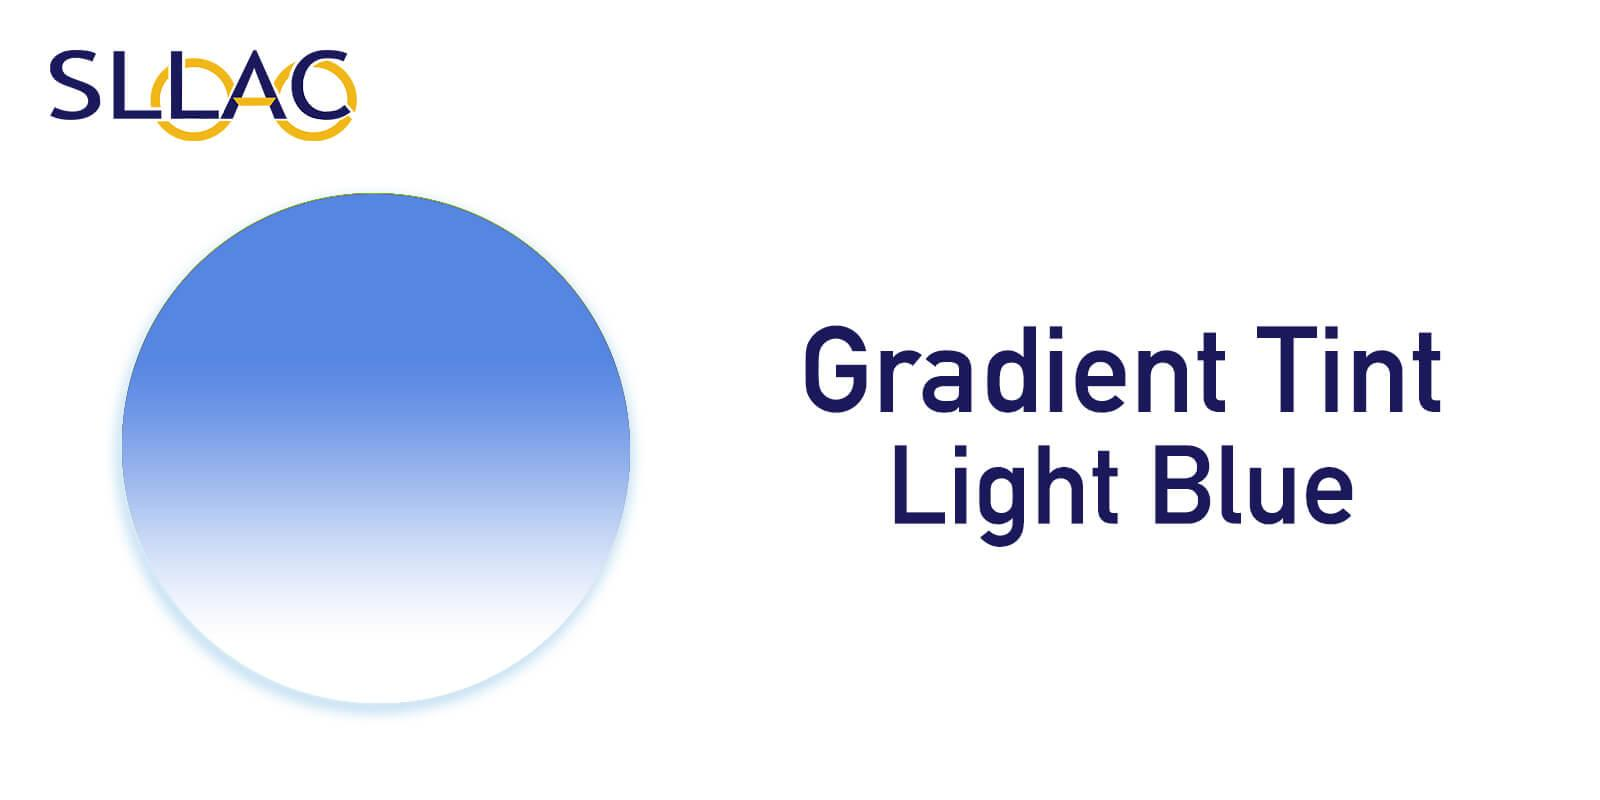 Gradient Lens Tint - Light (20%) Pink- main image